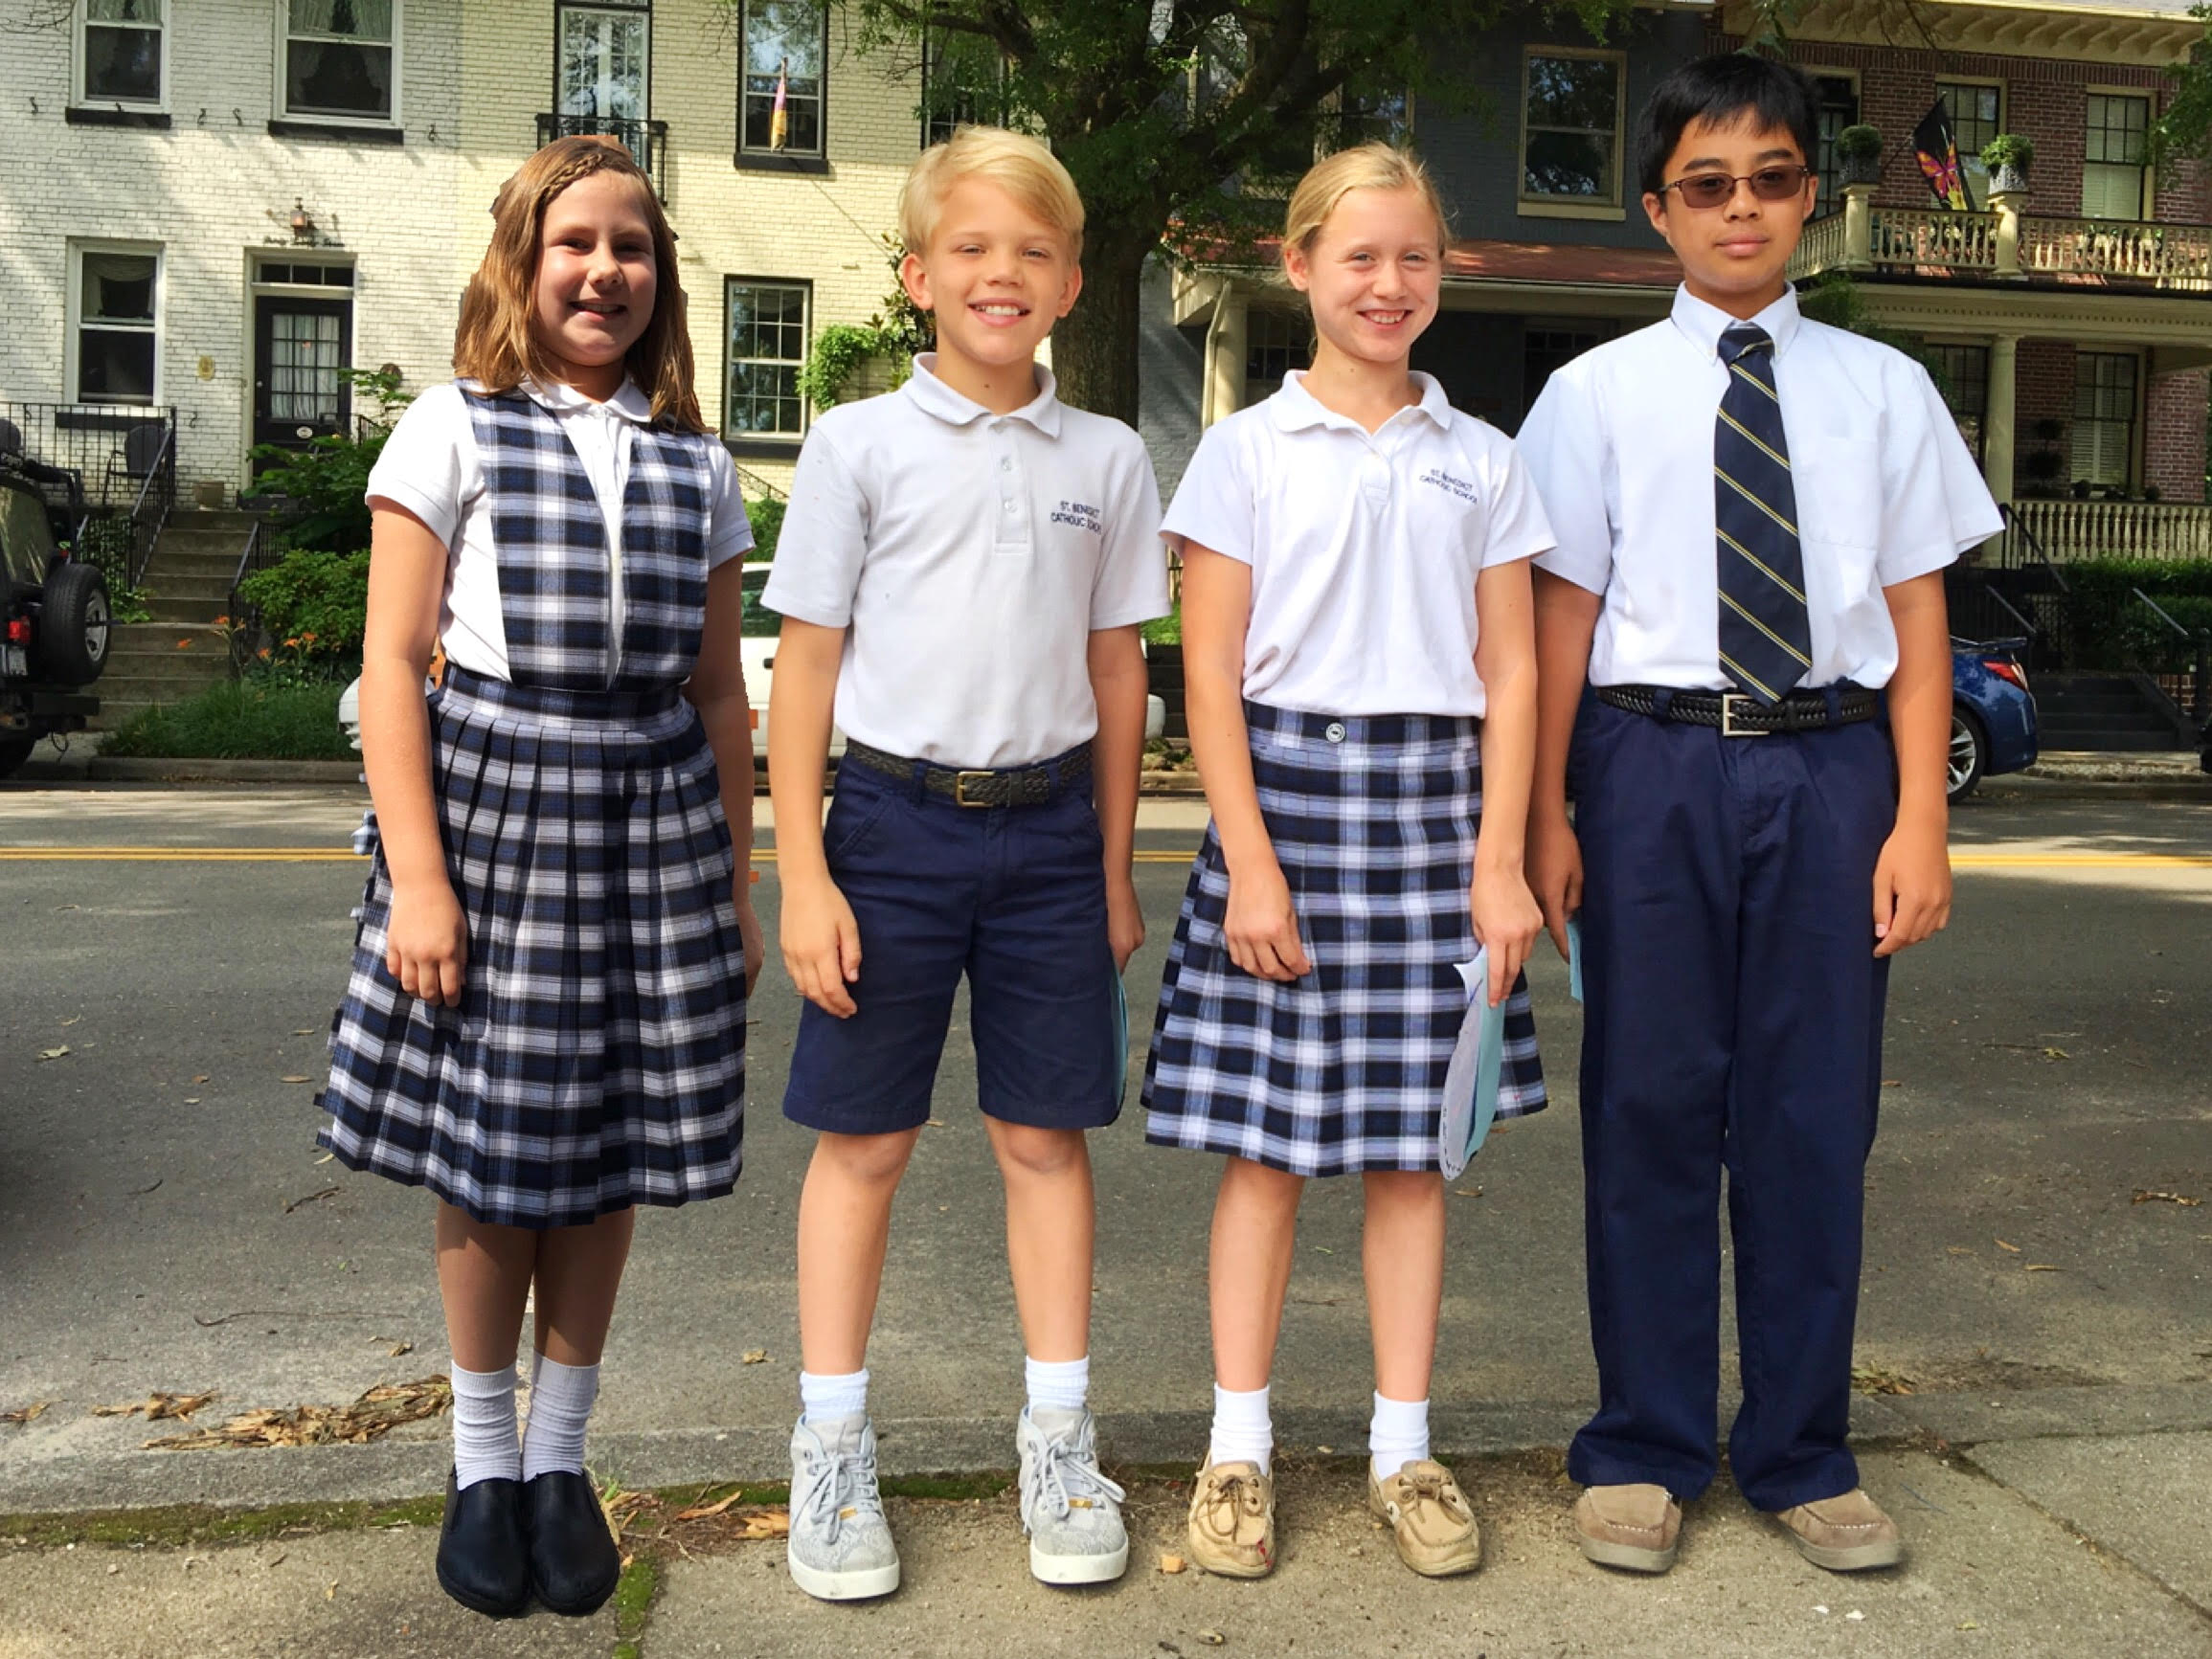 School Uniform Argumentative Essay